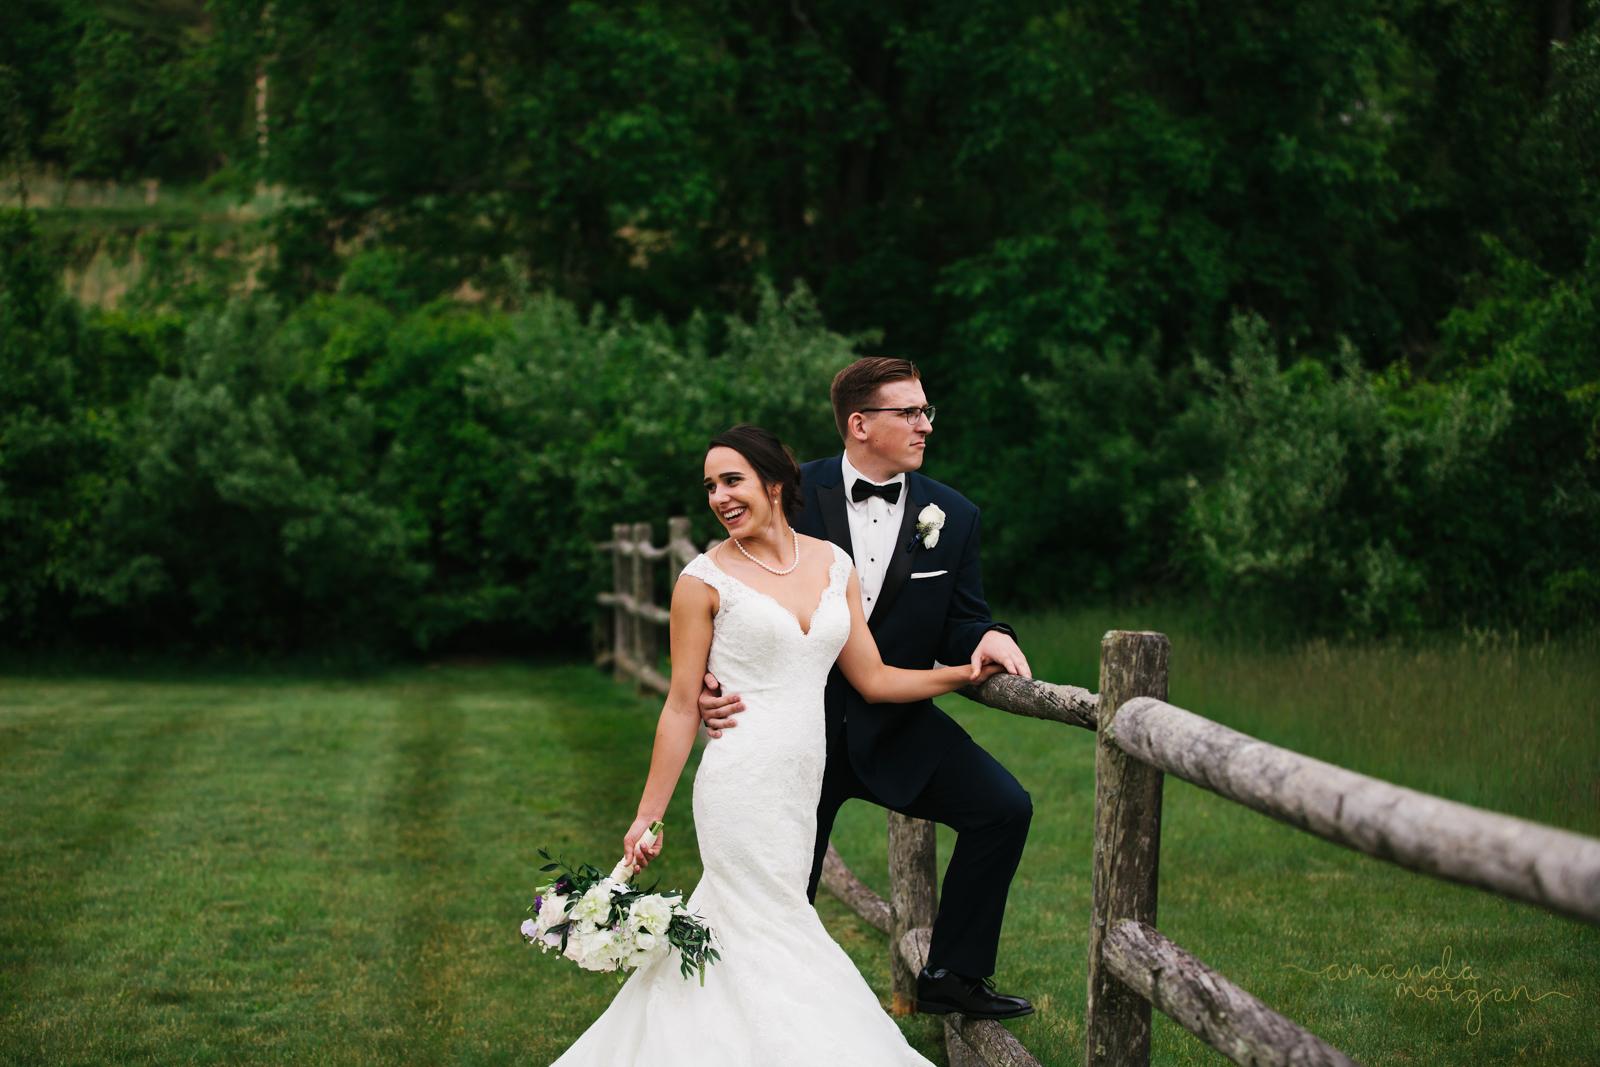 Publick-House-Wedding-Amanda-Morgan-37.jpg